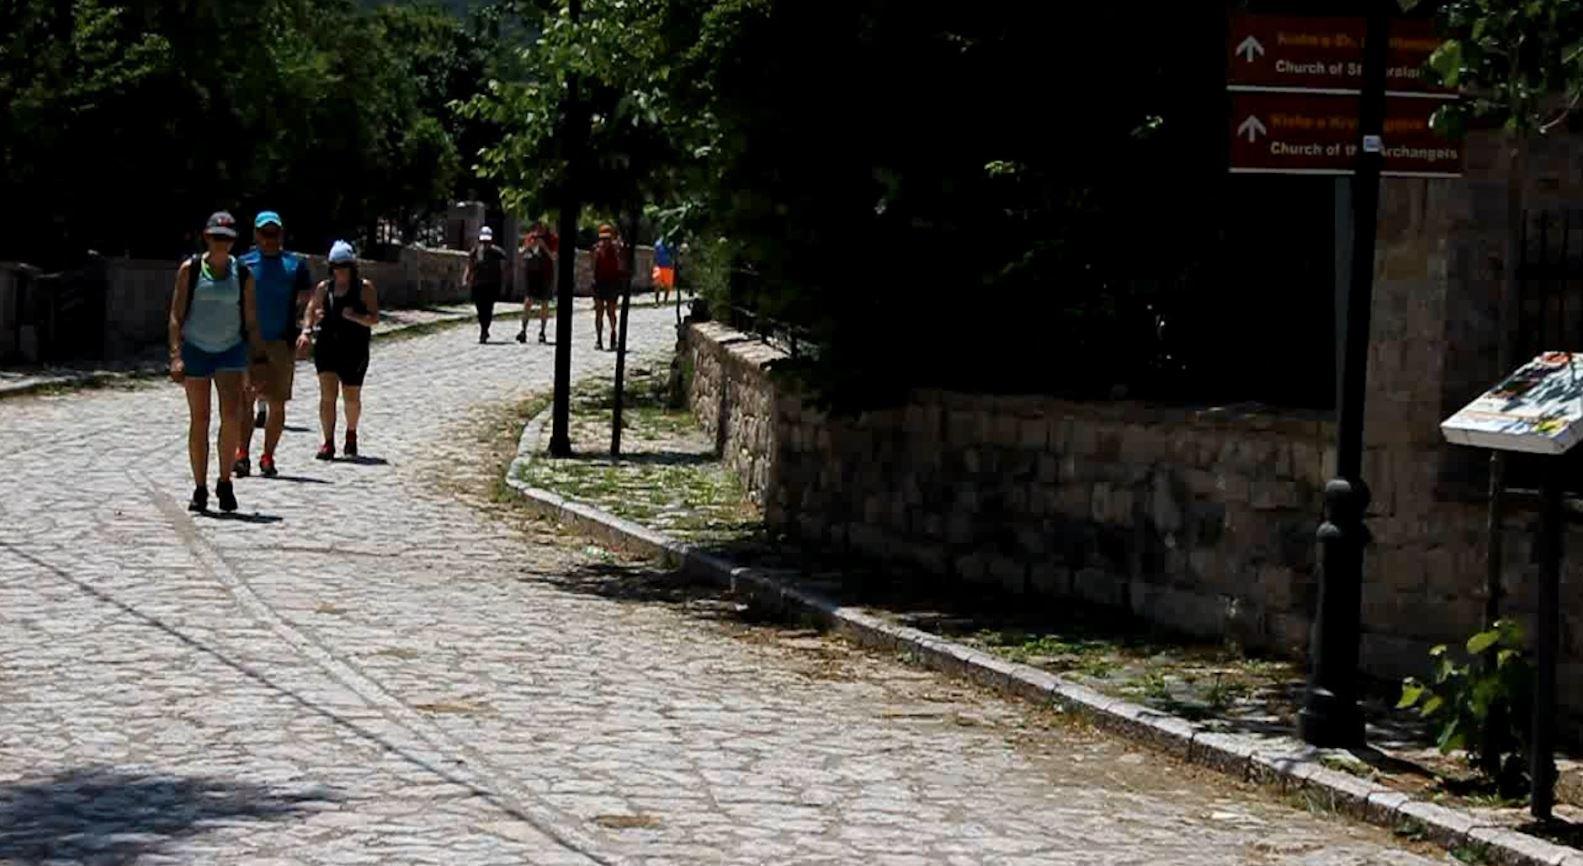 Voskopoja, fshati që synon turizmin elitar